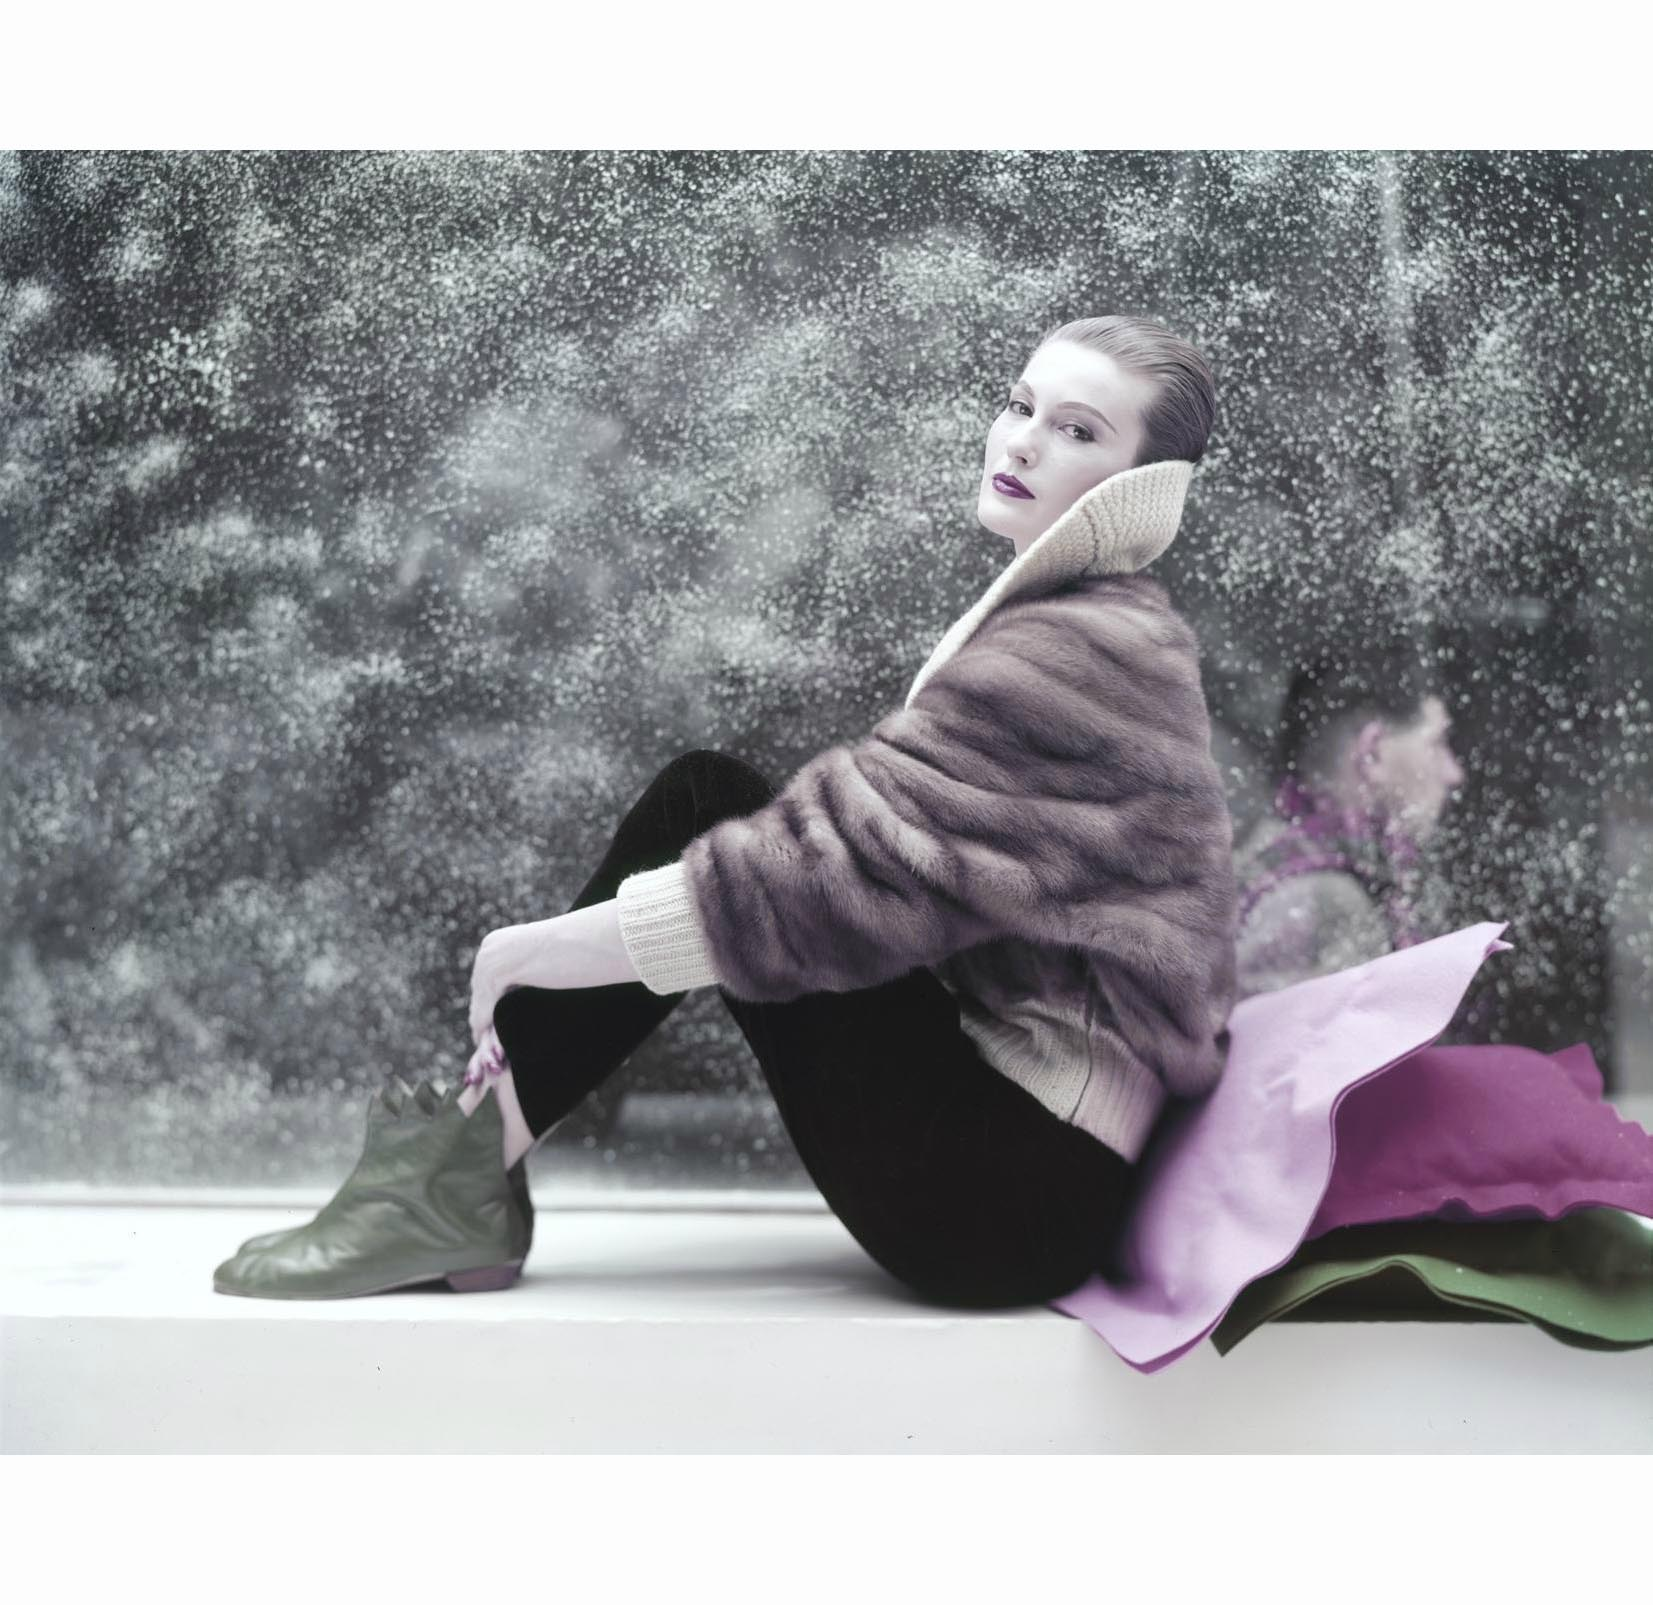 White Fur Stole >> Mary Jane Russell | © Pleasurephoto